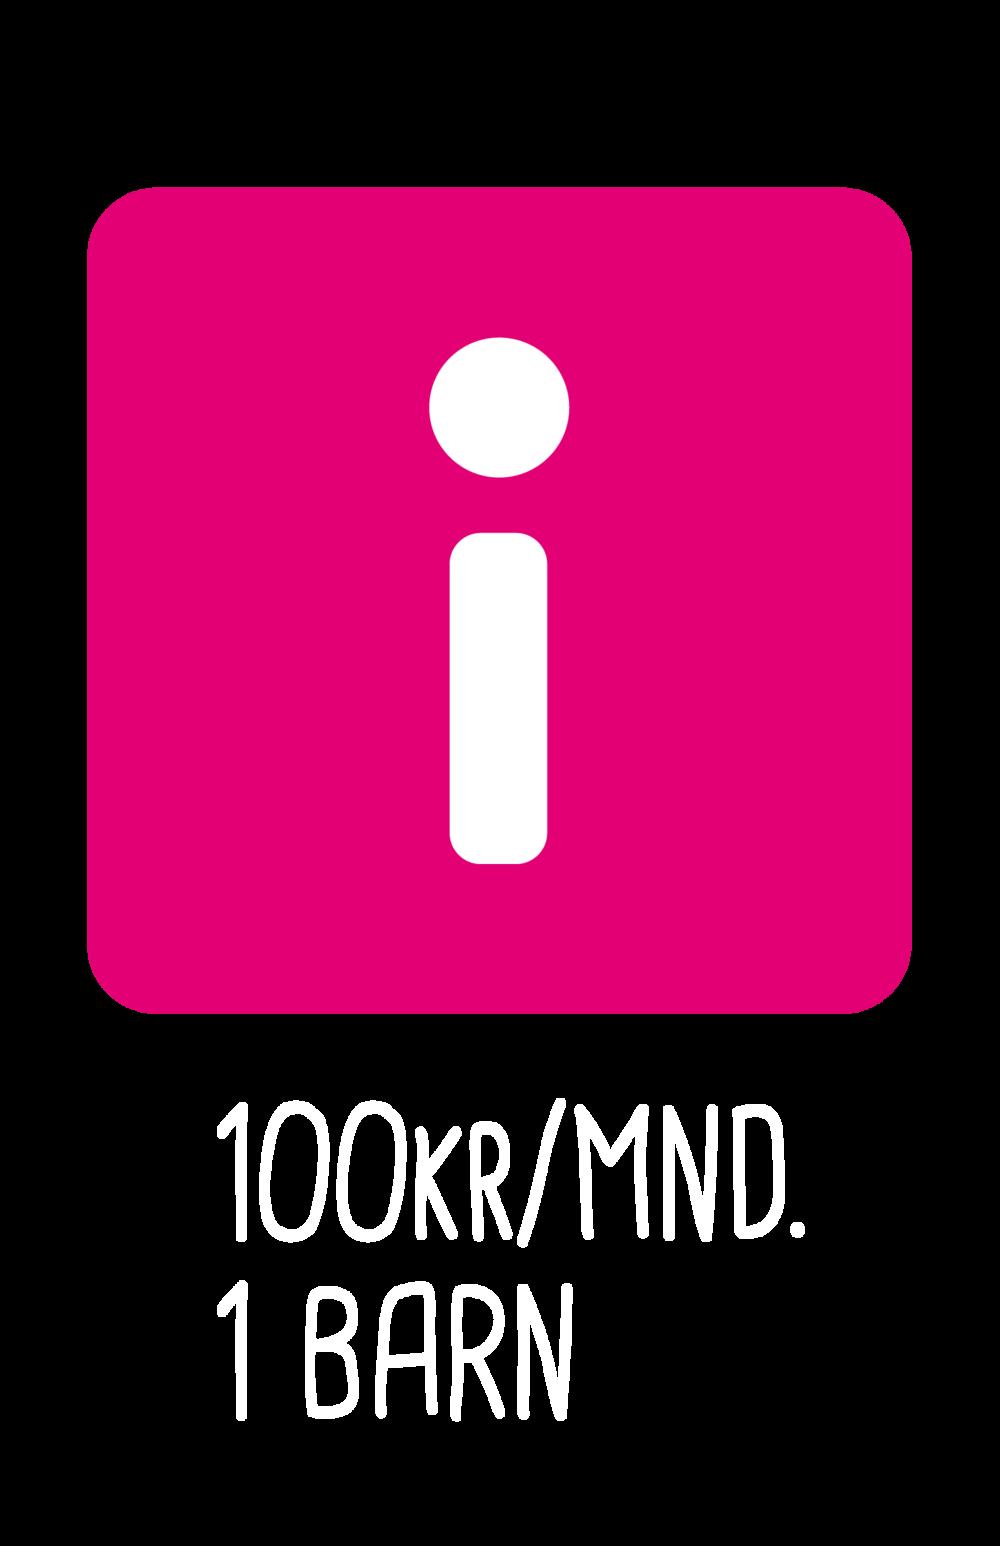 Donate 100KR/MND. 1 Barn